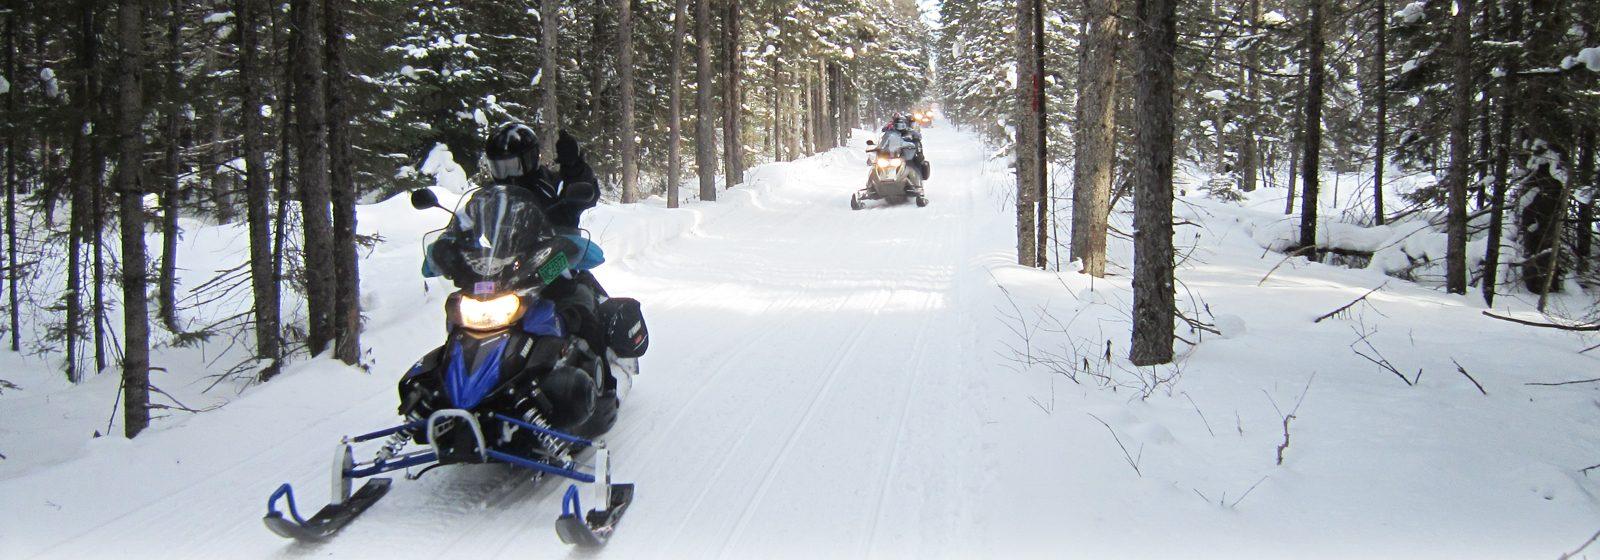 Snowmobile Club of Edwardsburg, Cass County, MI